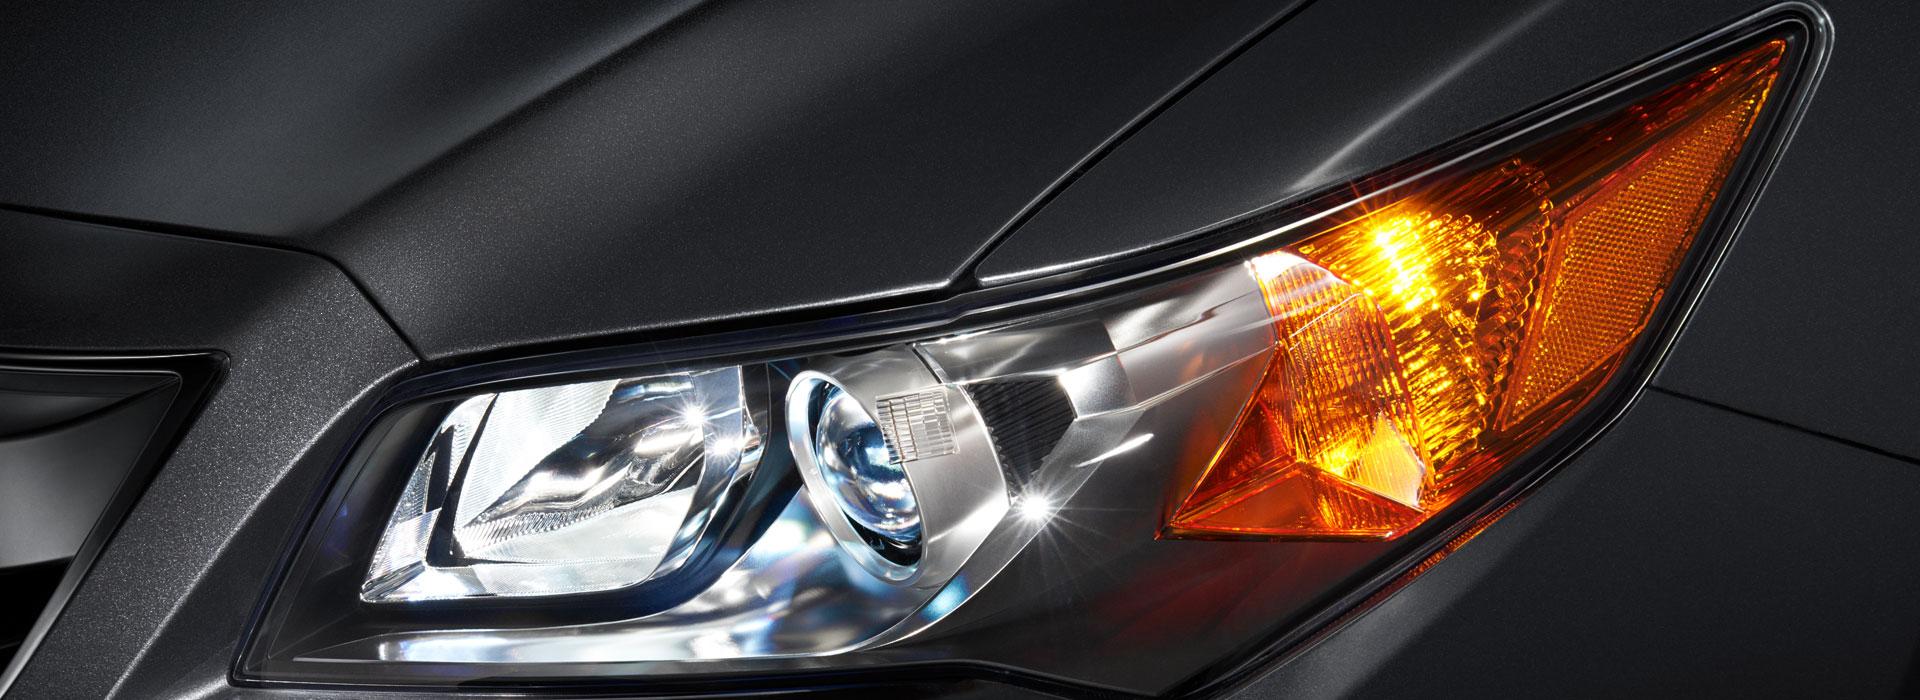 Acura Headlight